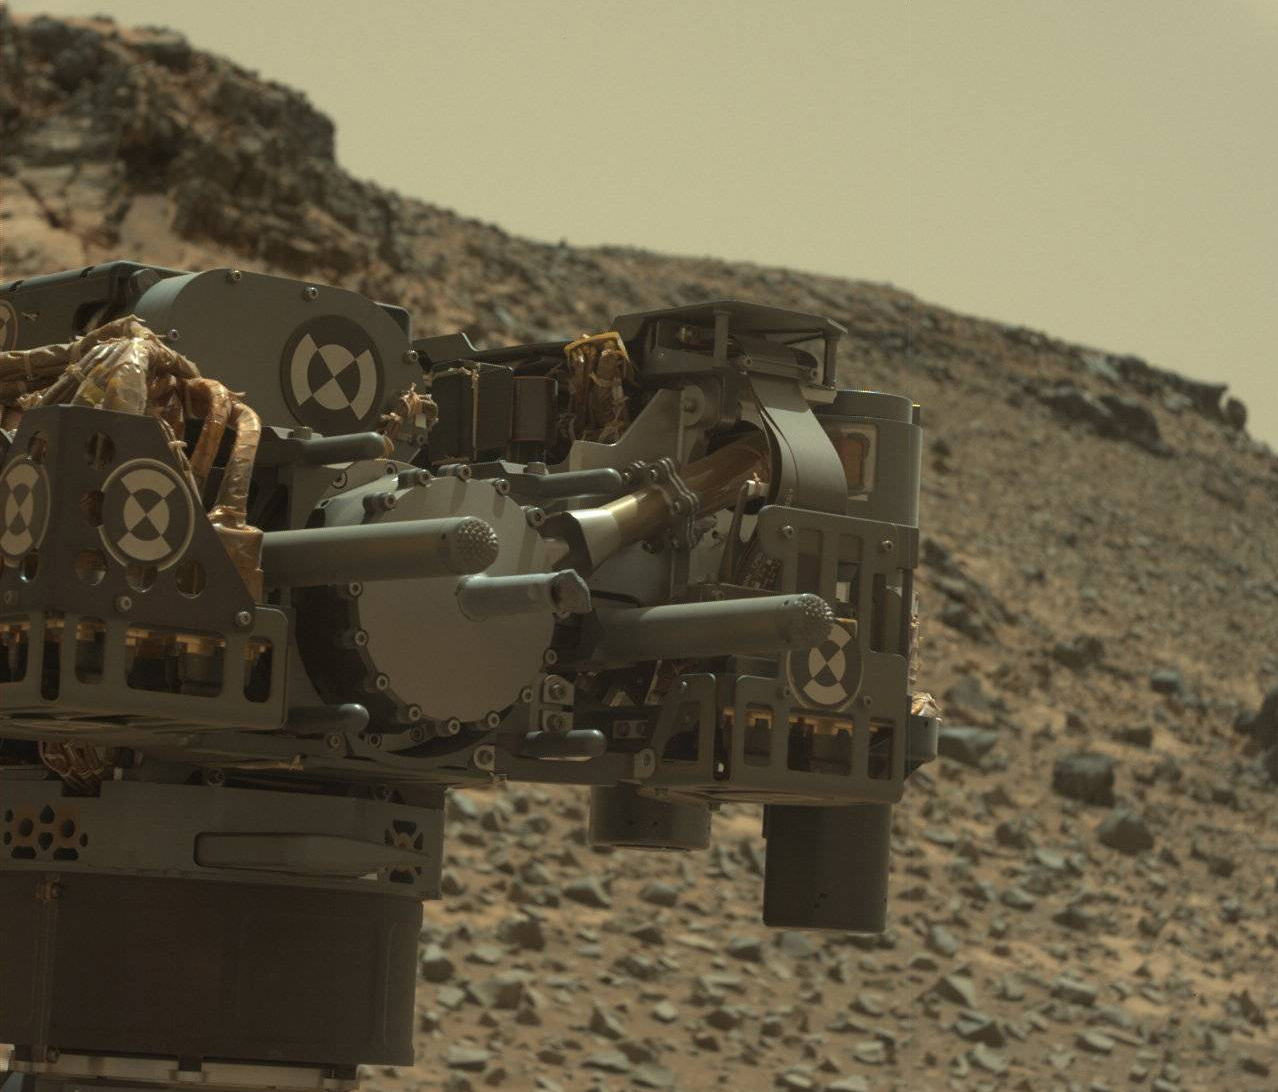 File photo of Curiosity's drill bit from Feb. 24, 2015. Credit: NASA/JPL-Caltech/MSSS